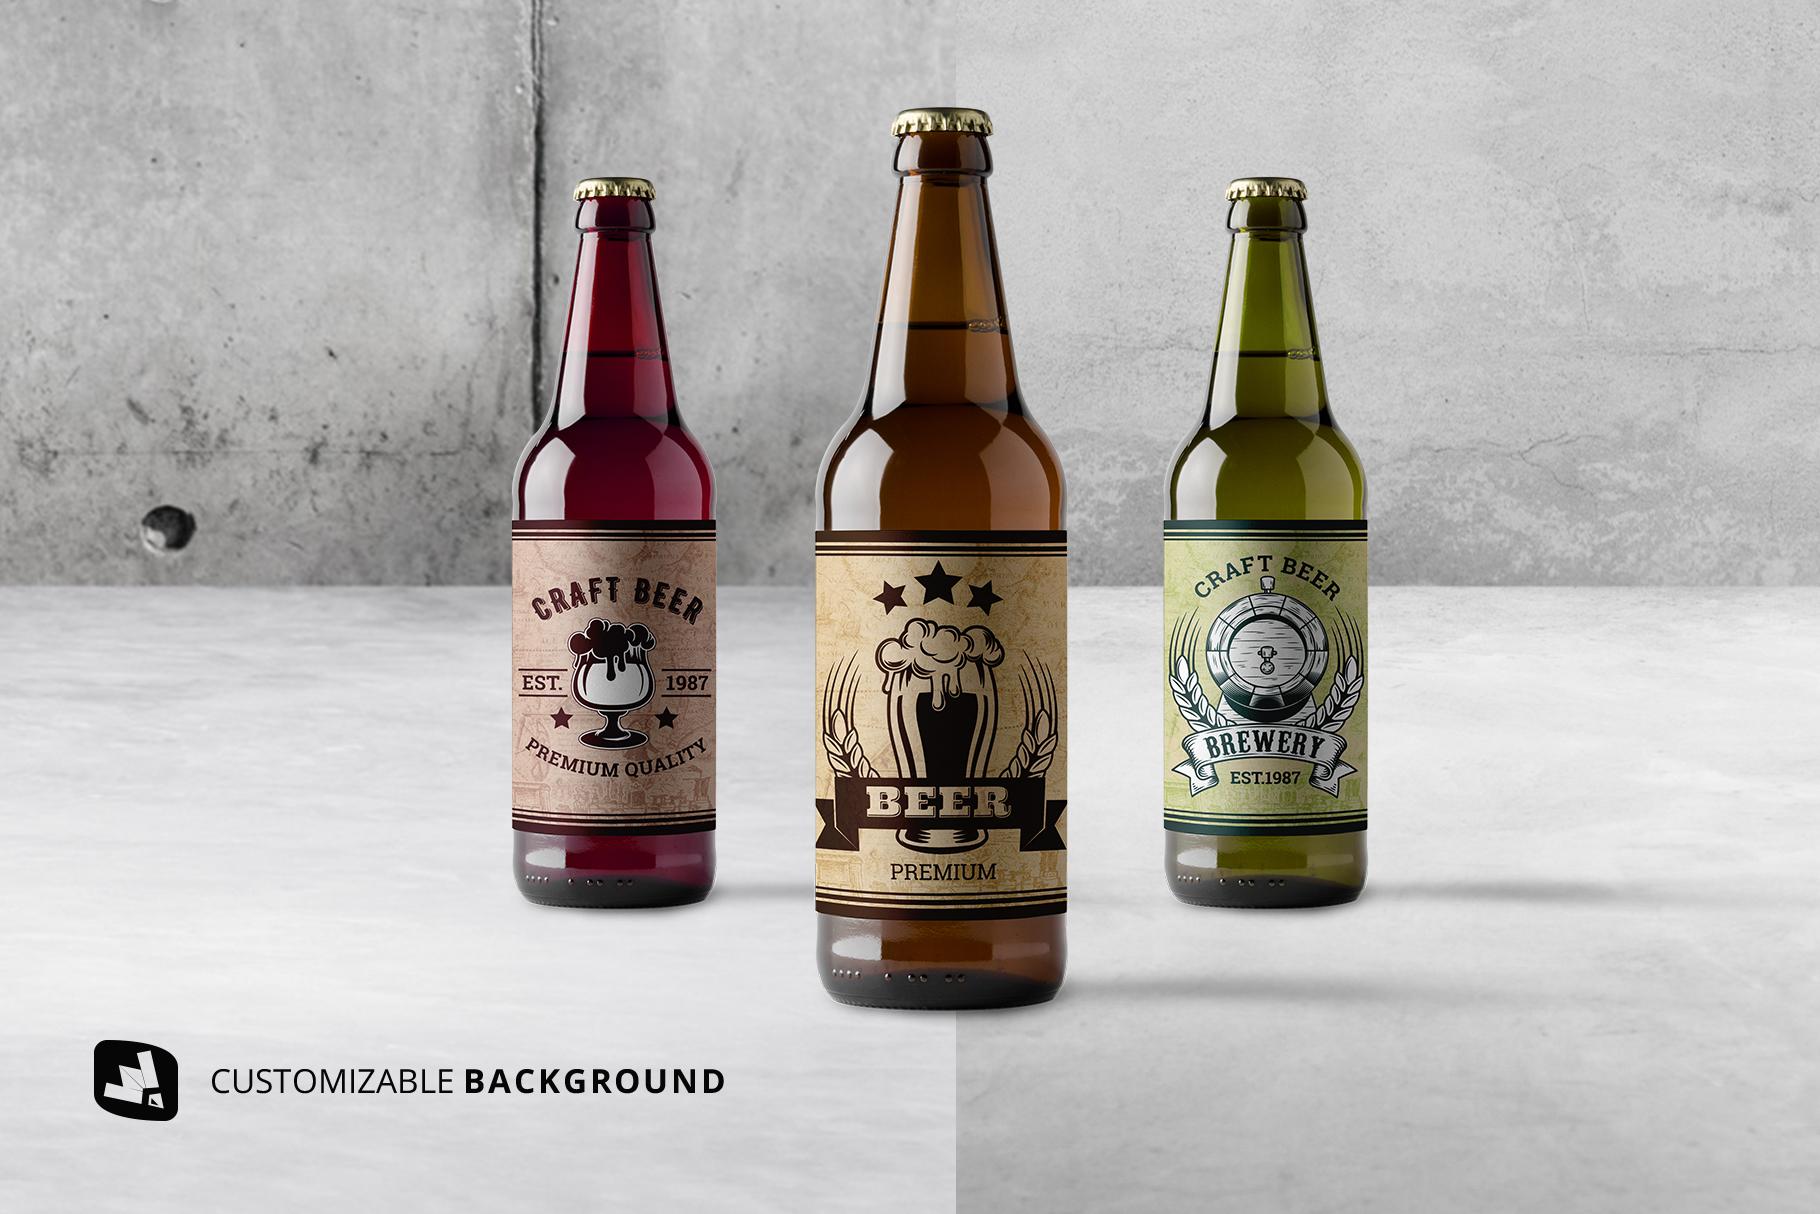 background options of the craft beer bottle packaging mockup